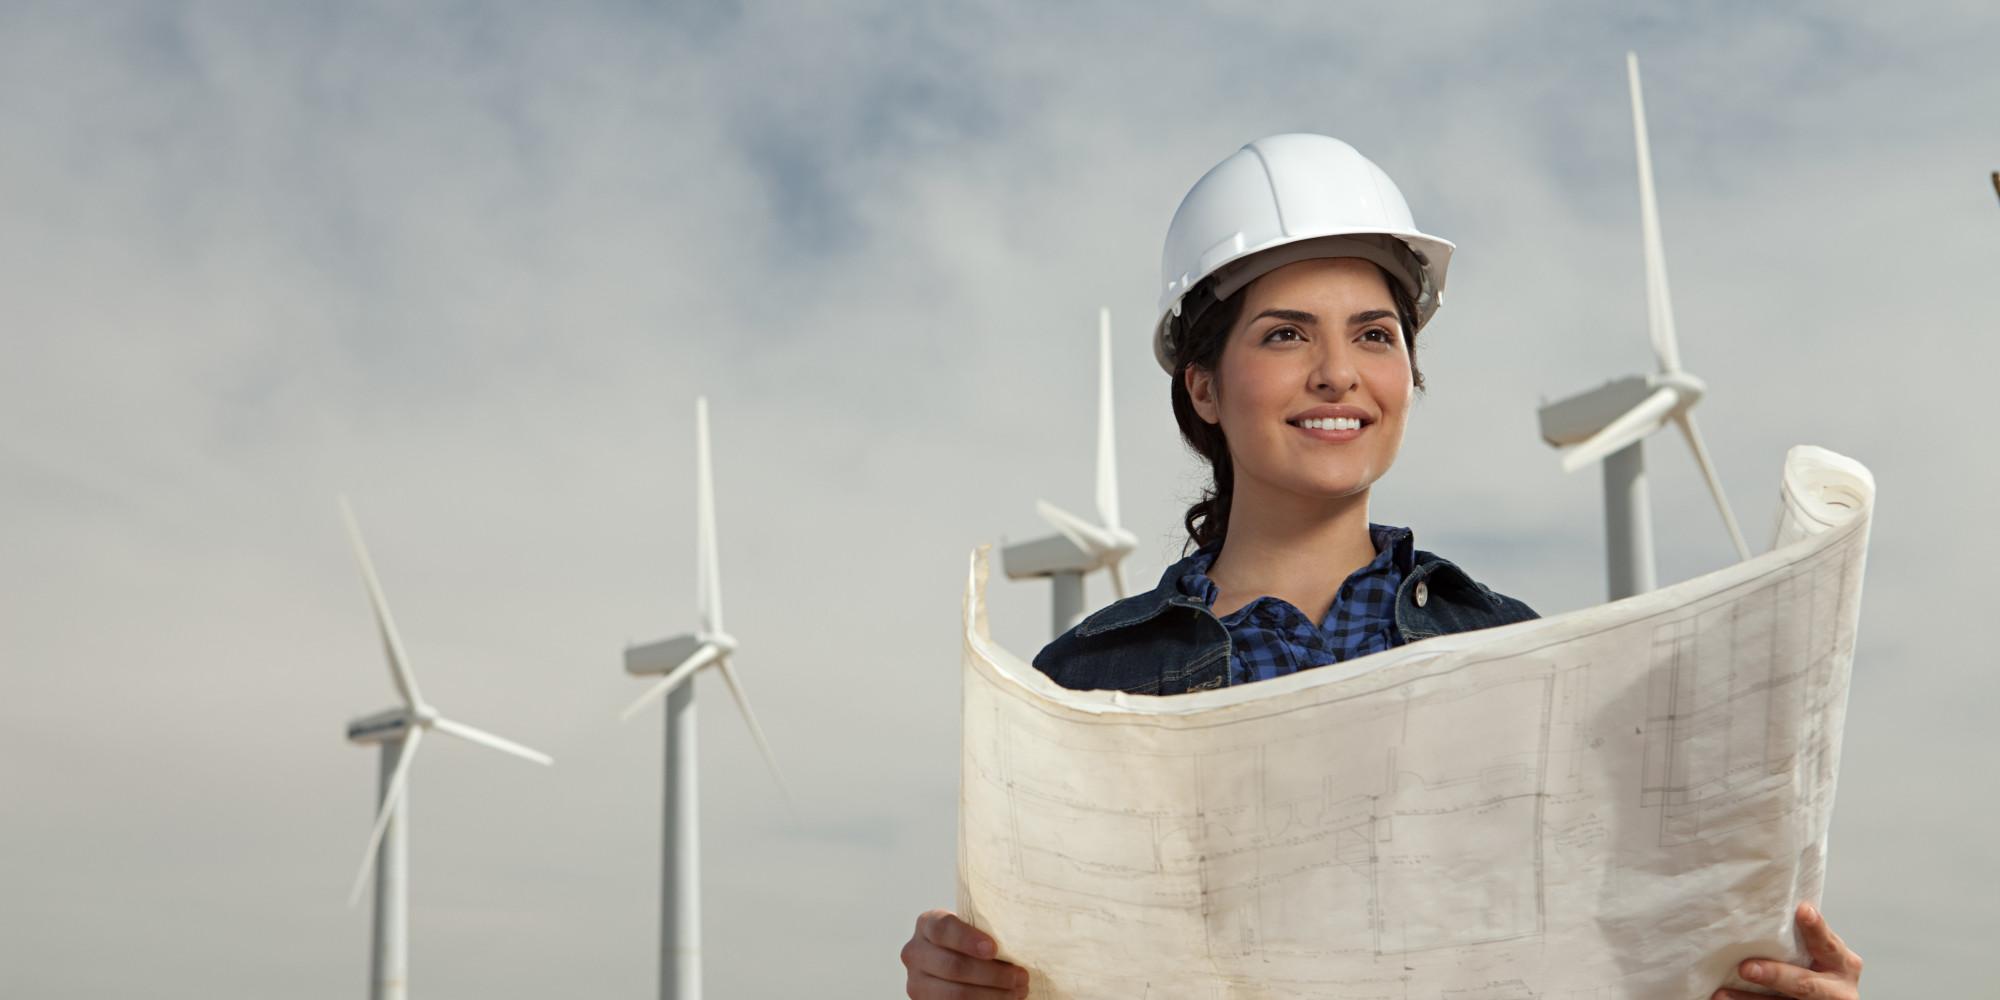 o-women-engineer-facebook